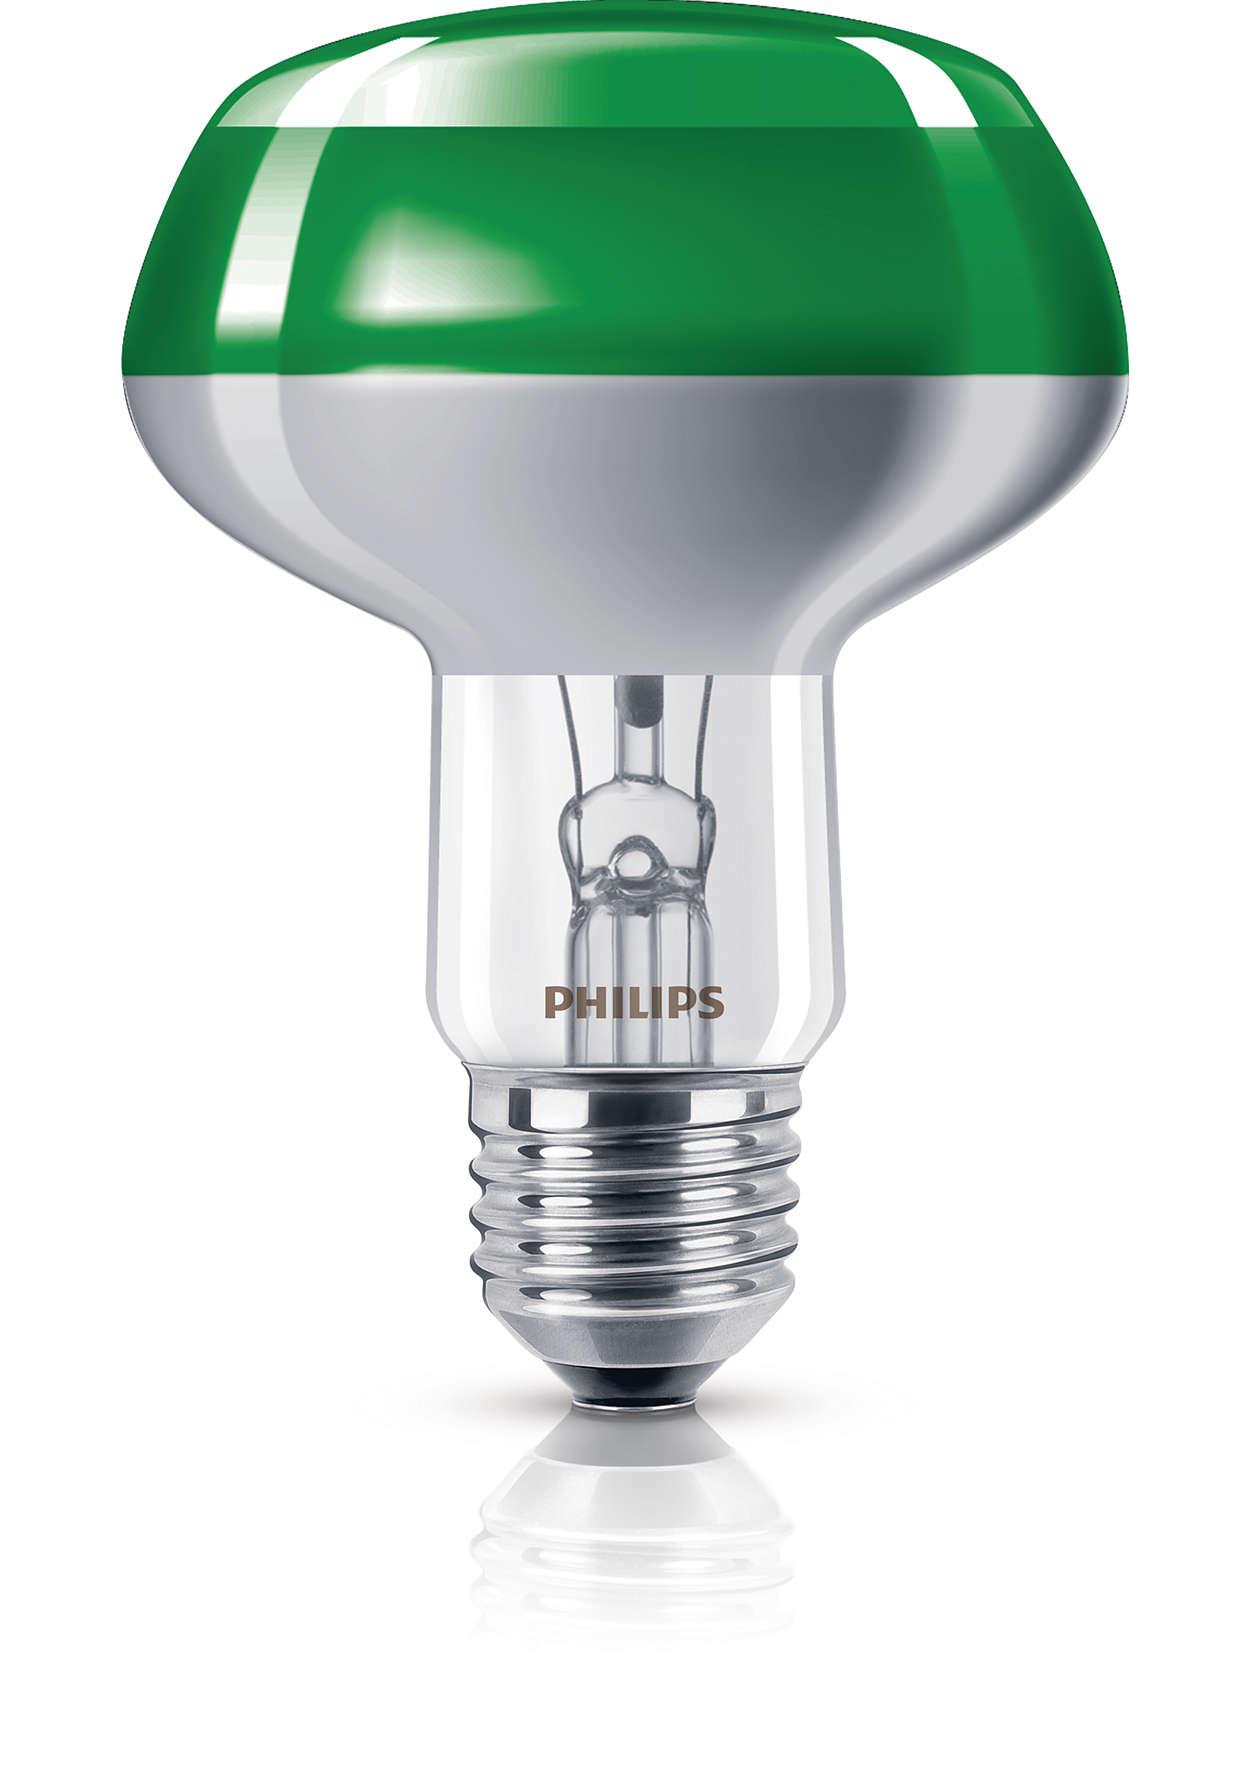 Farbige Reflektorlampe